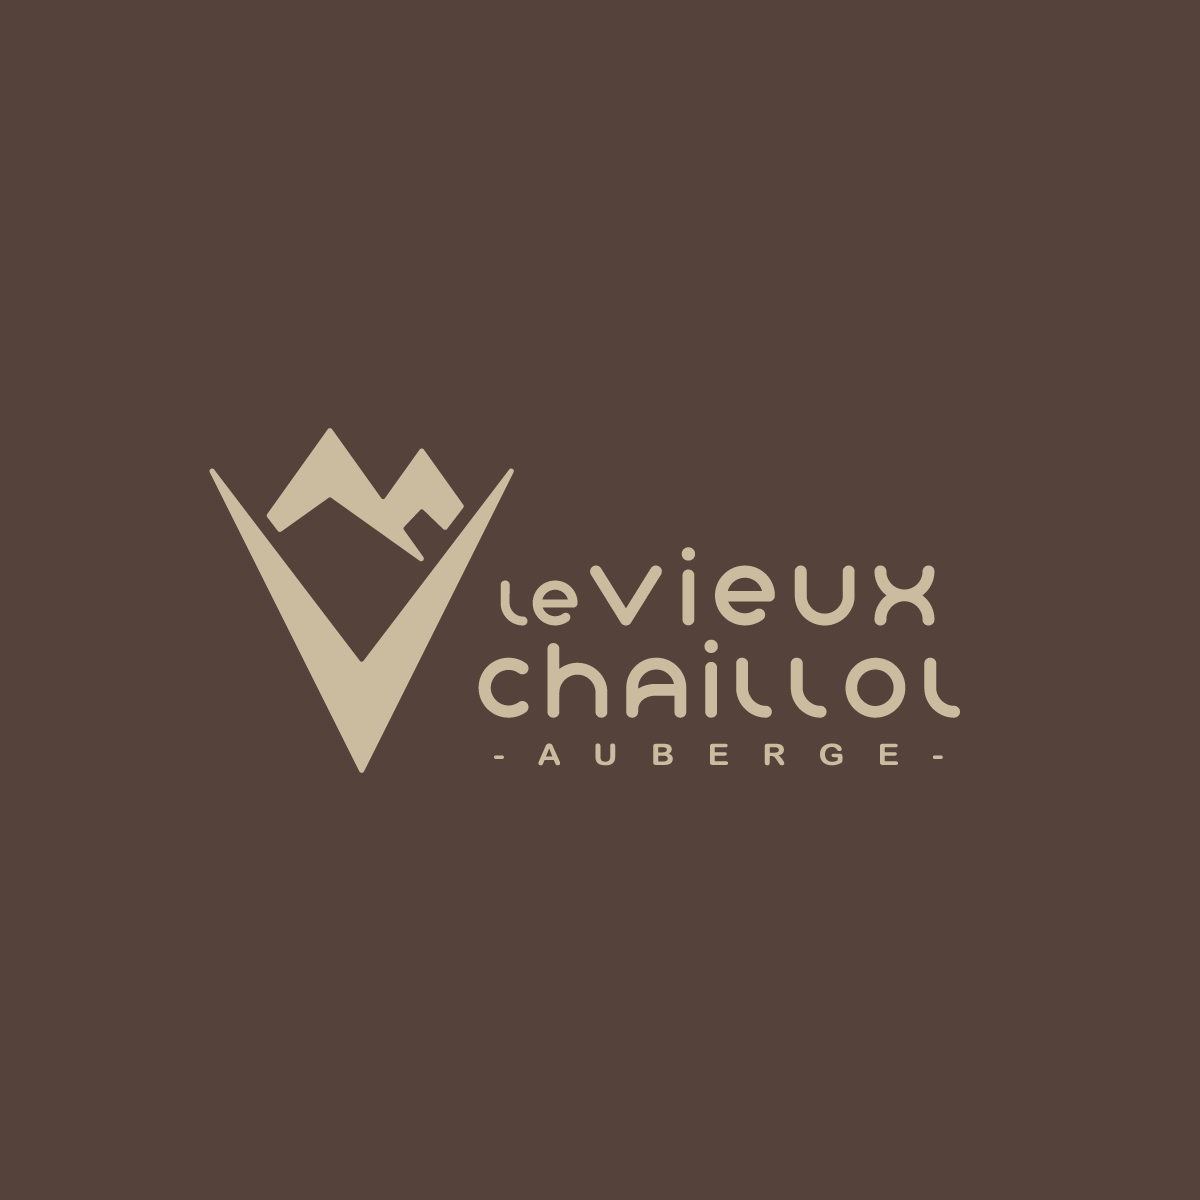 auberge-le-vieux-chaillol-creation-logo